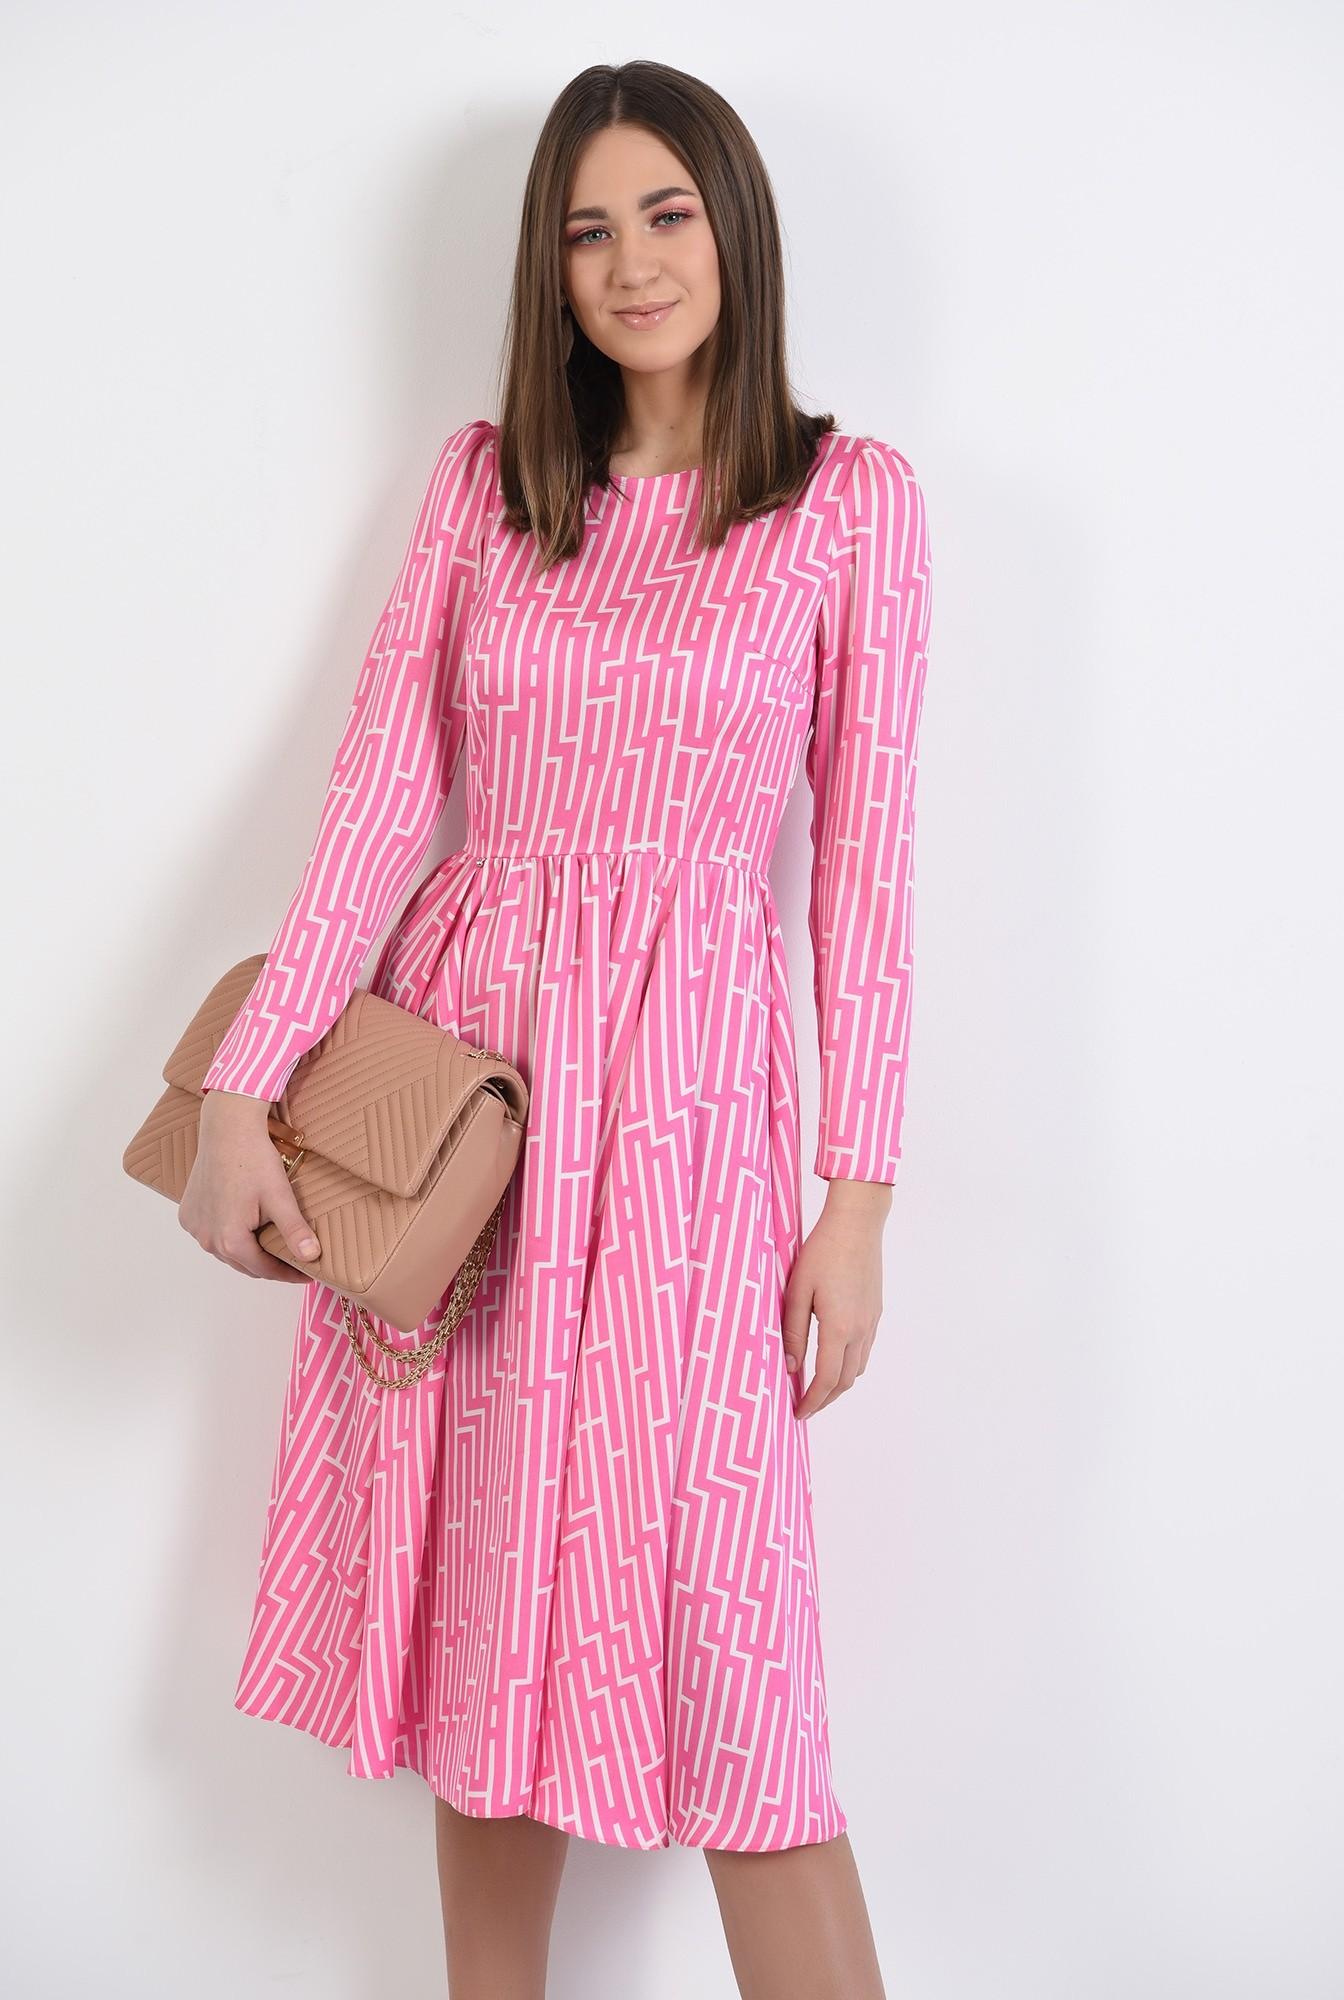 0 - rochie midi, evazata, cu motive geometrice, maneci lungi, roz